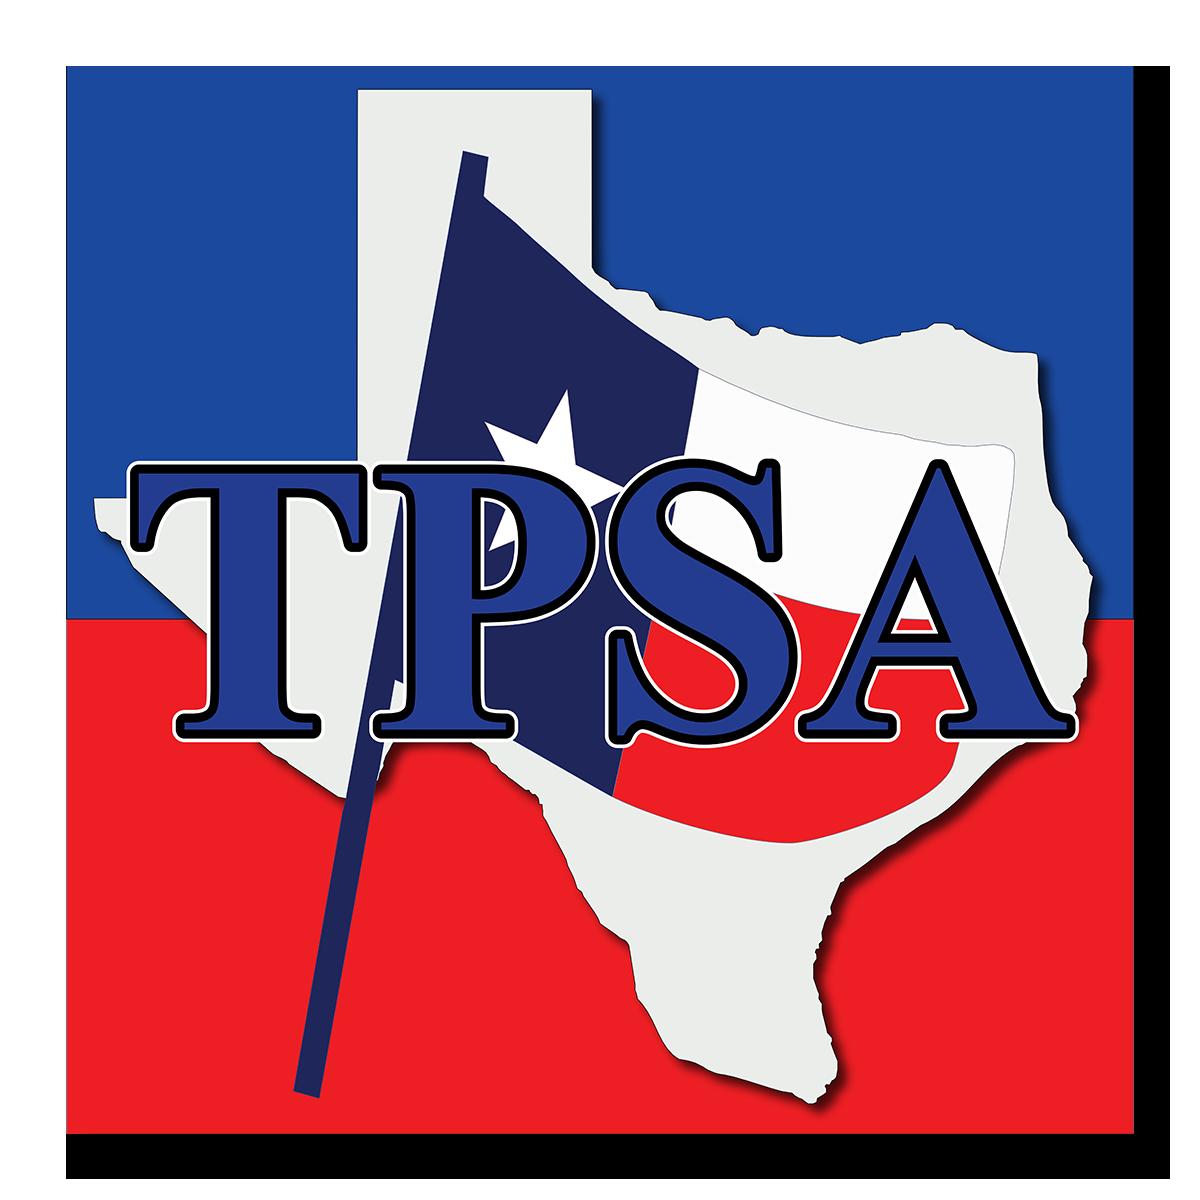 Congress clipart capitol texas. Process servers association home